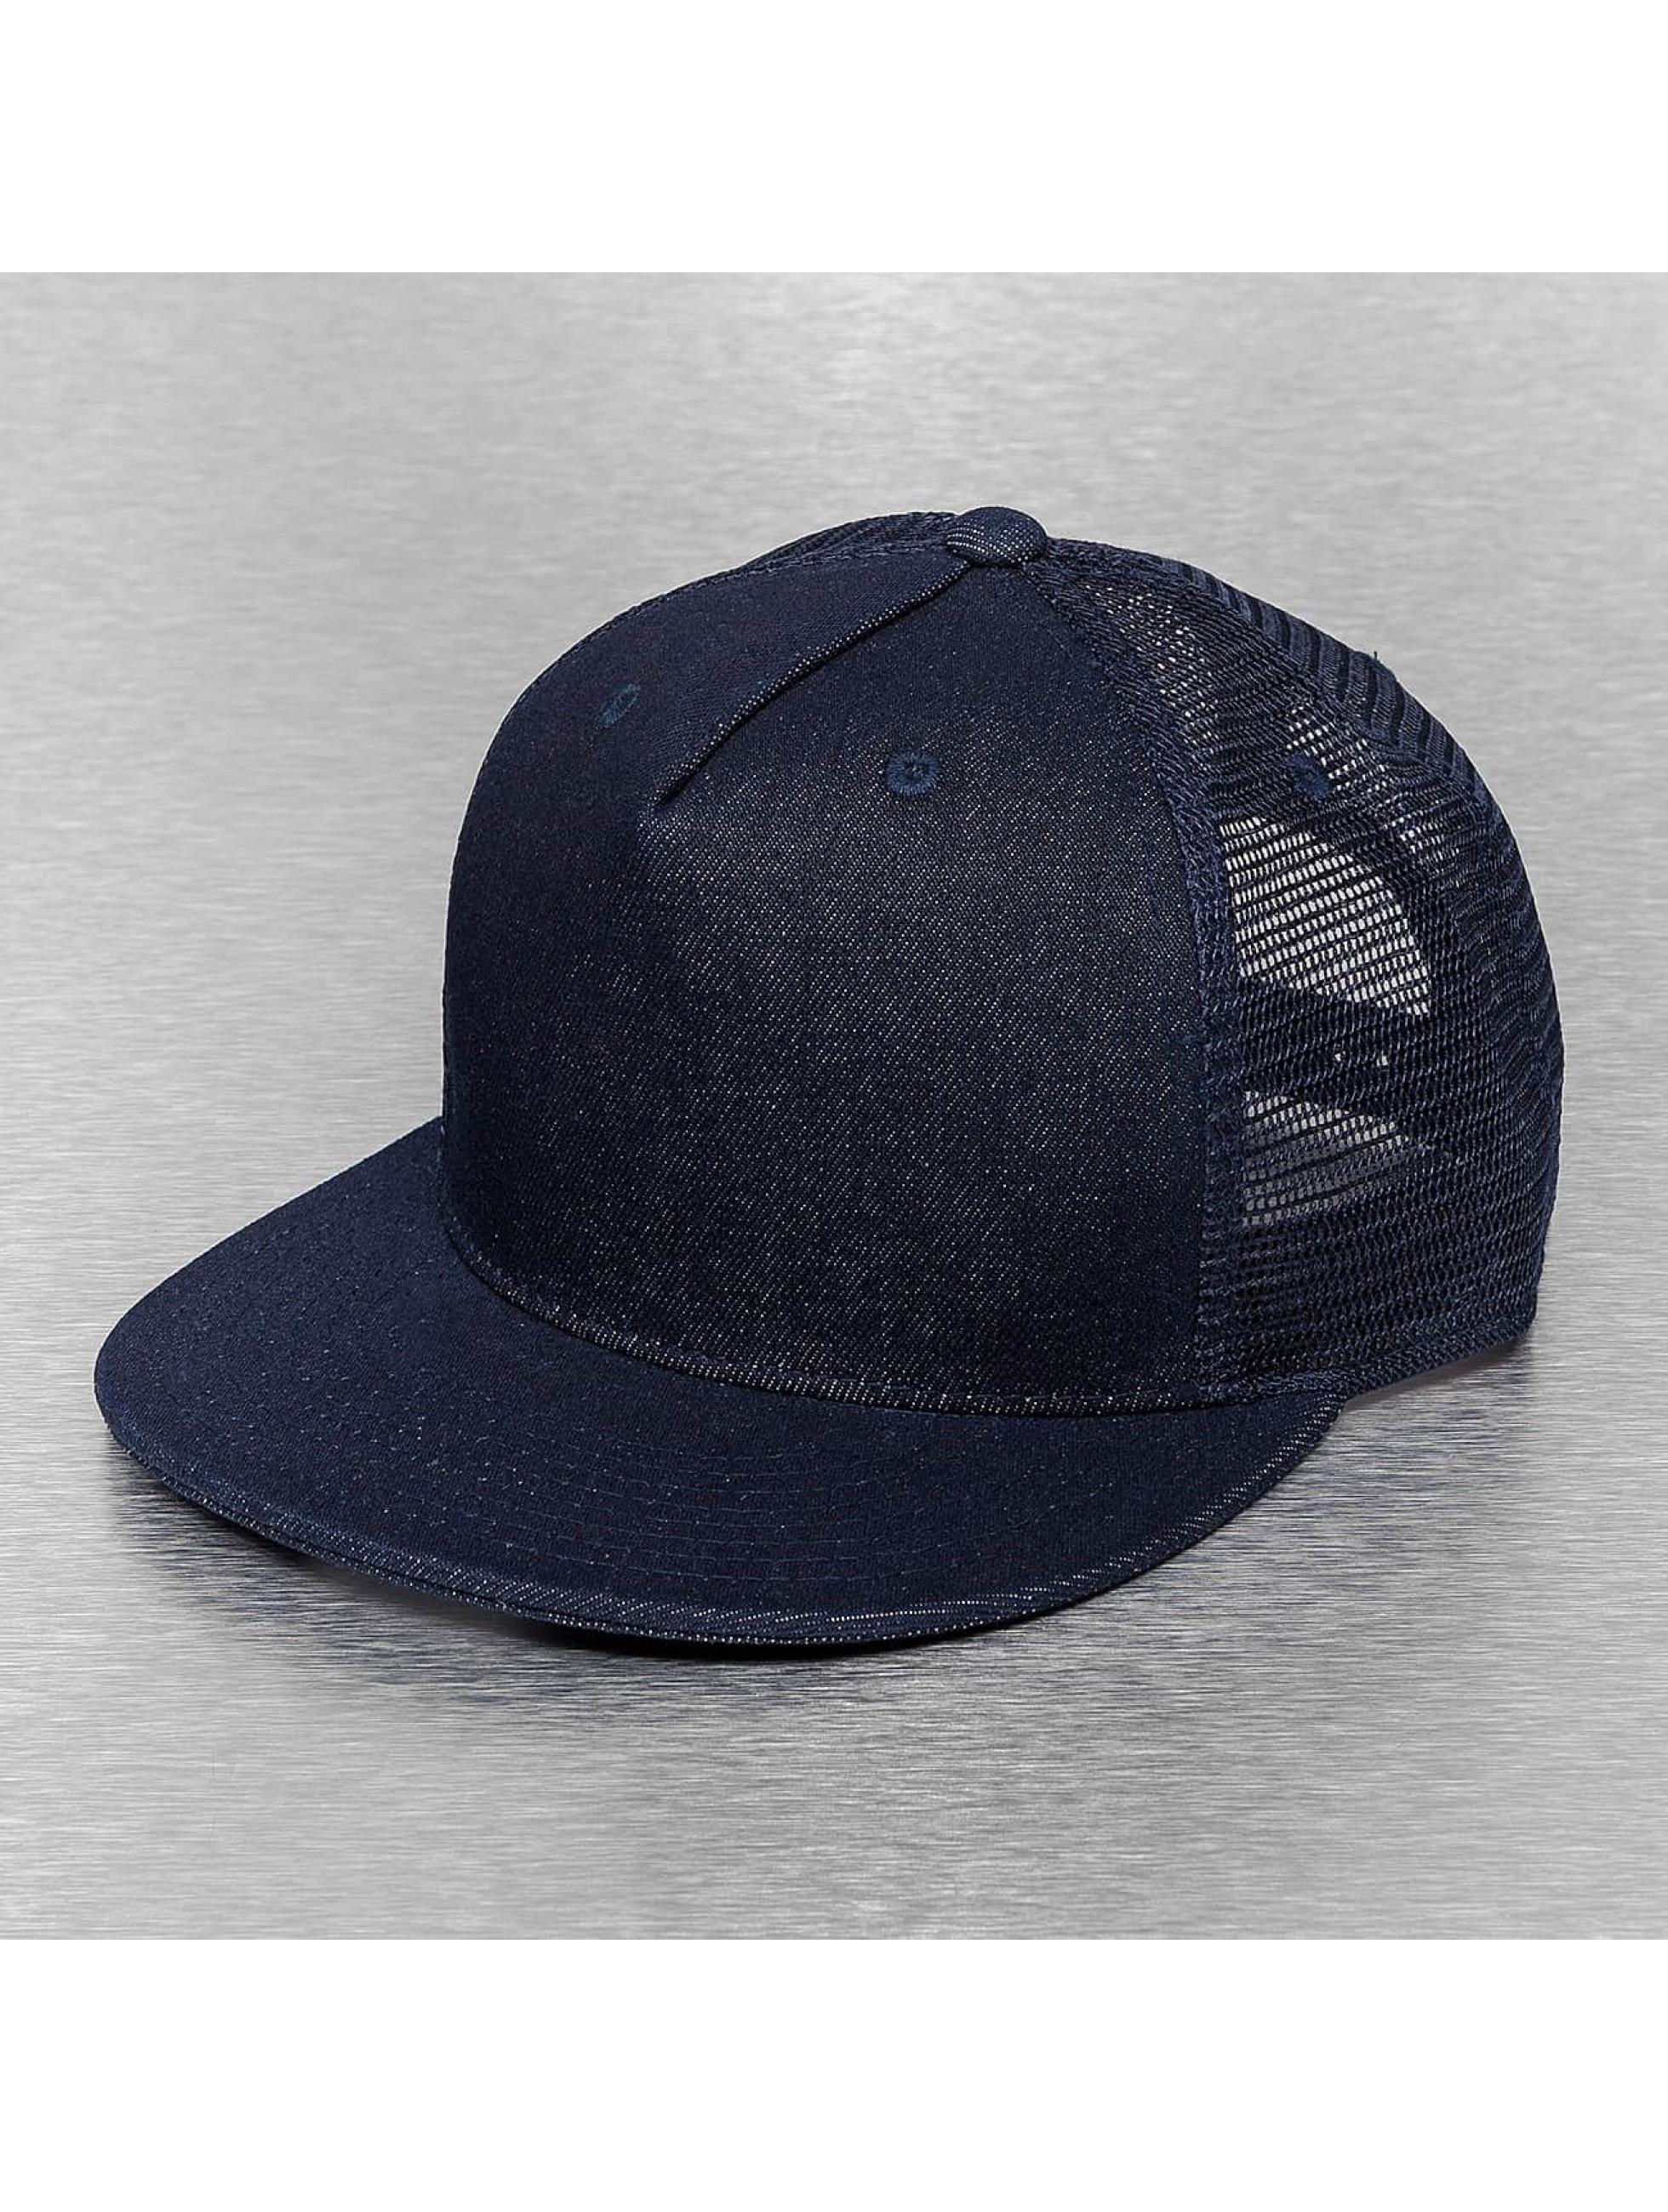 Cap Crony Кепка тракер Denim синий